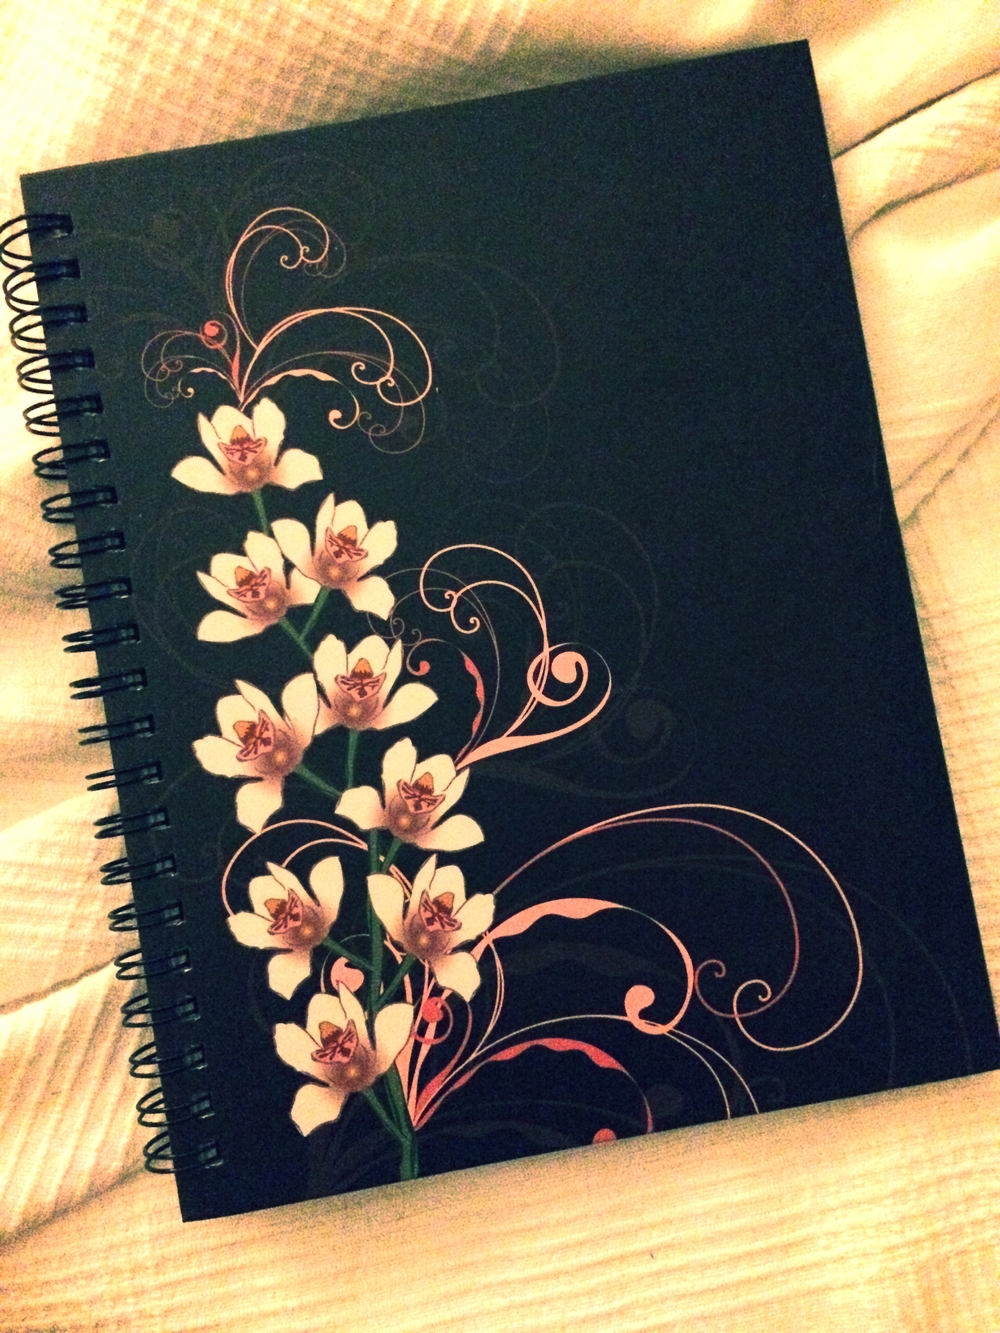 My journal...